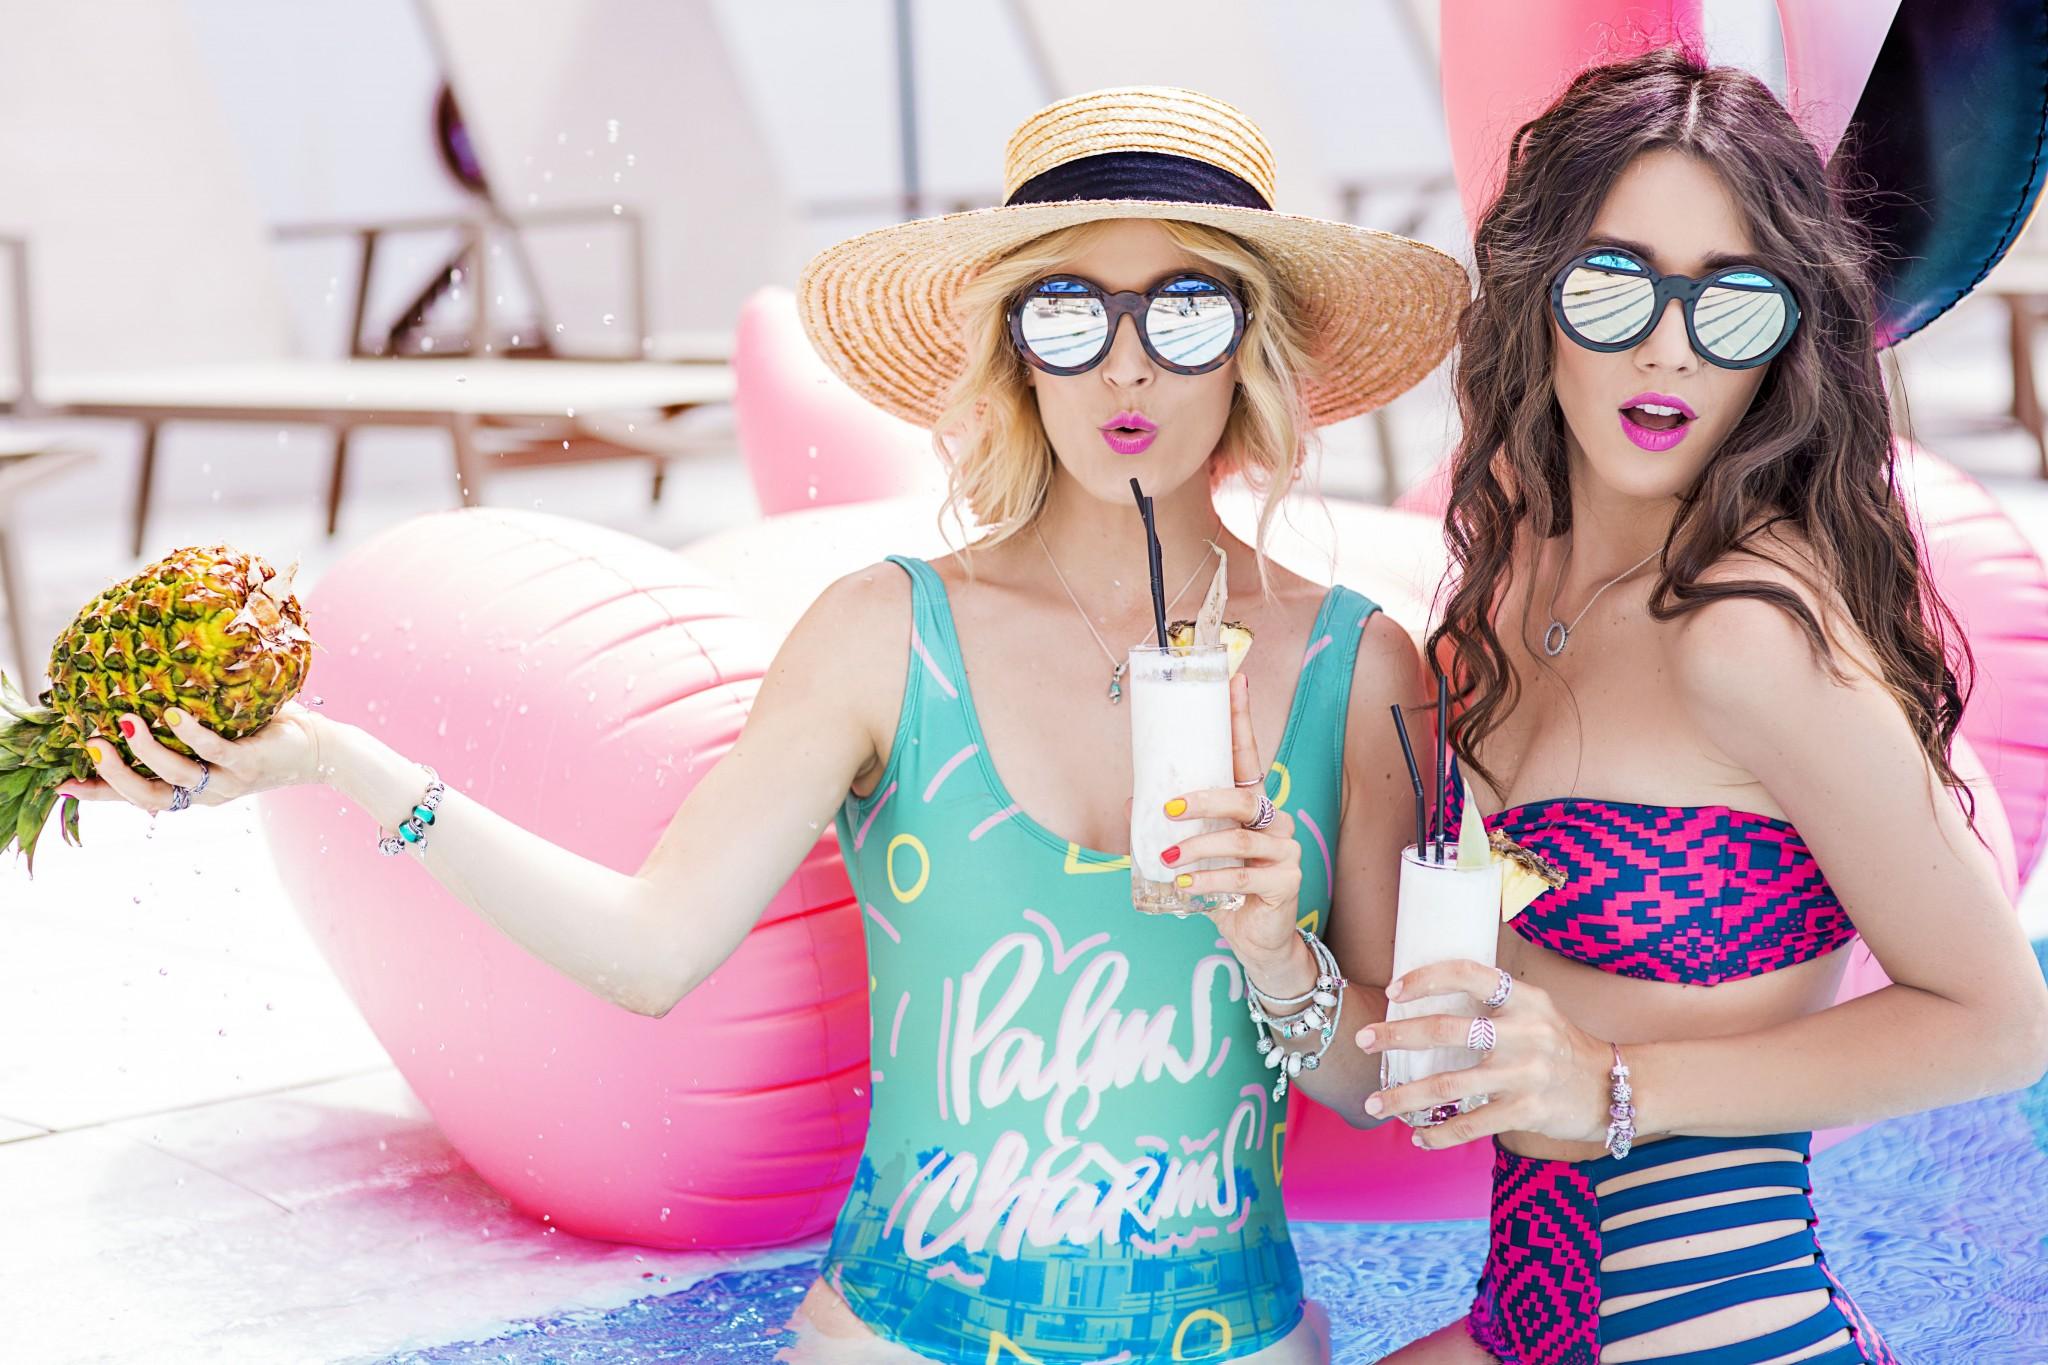 14fabulous_muses_pandora_summer2016_collection_youniverse_piscina